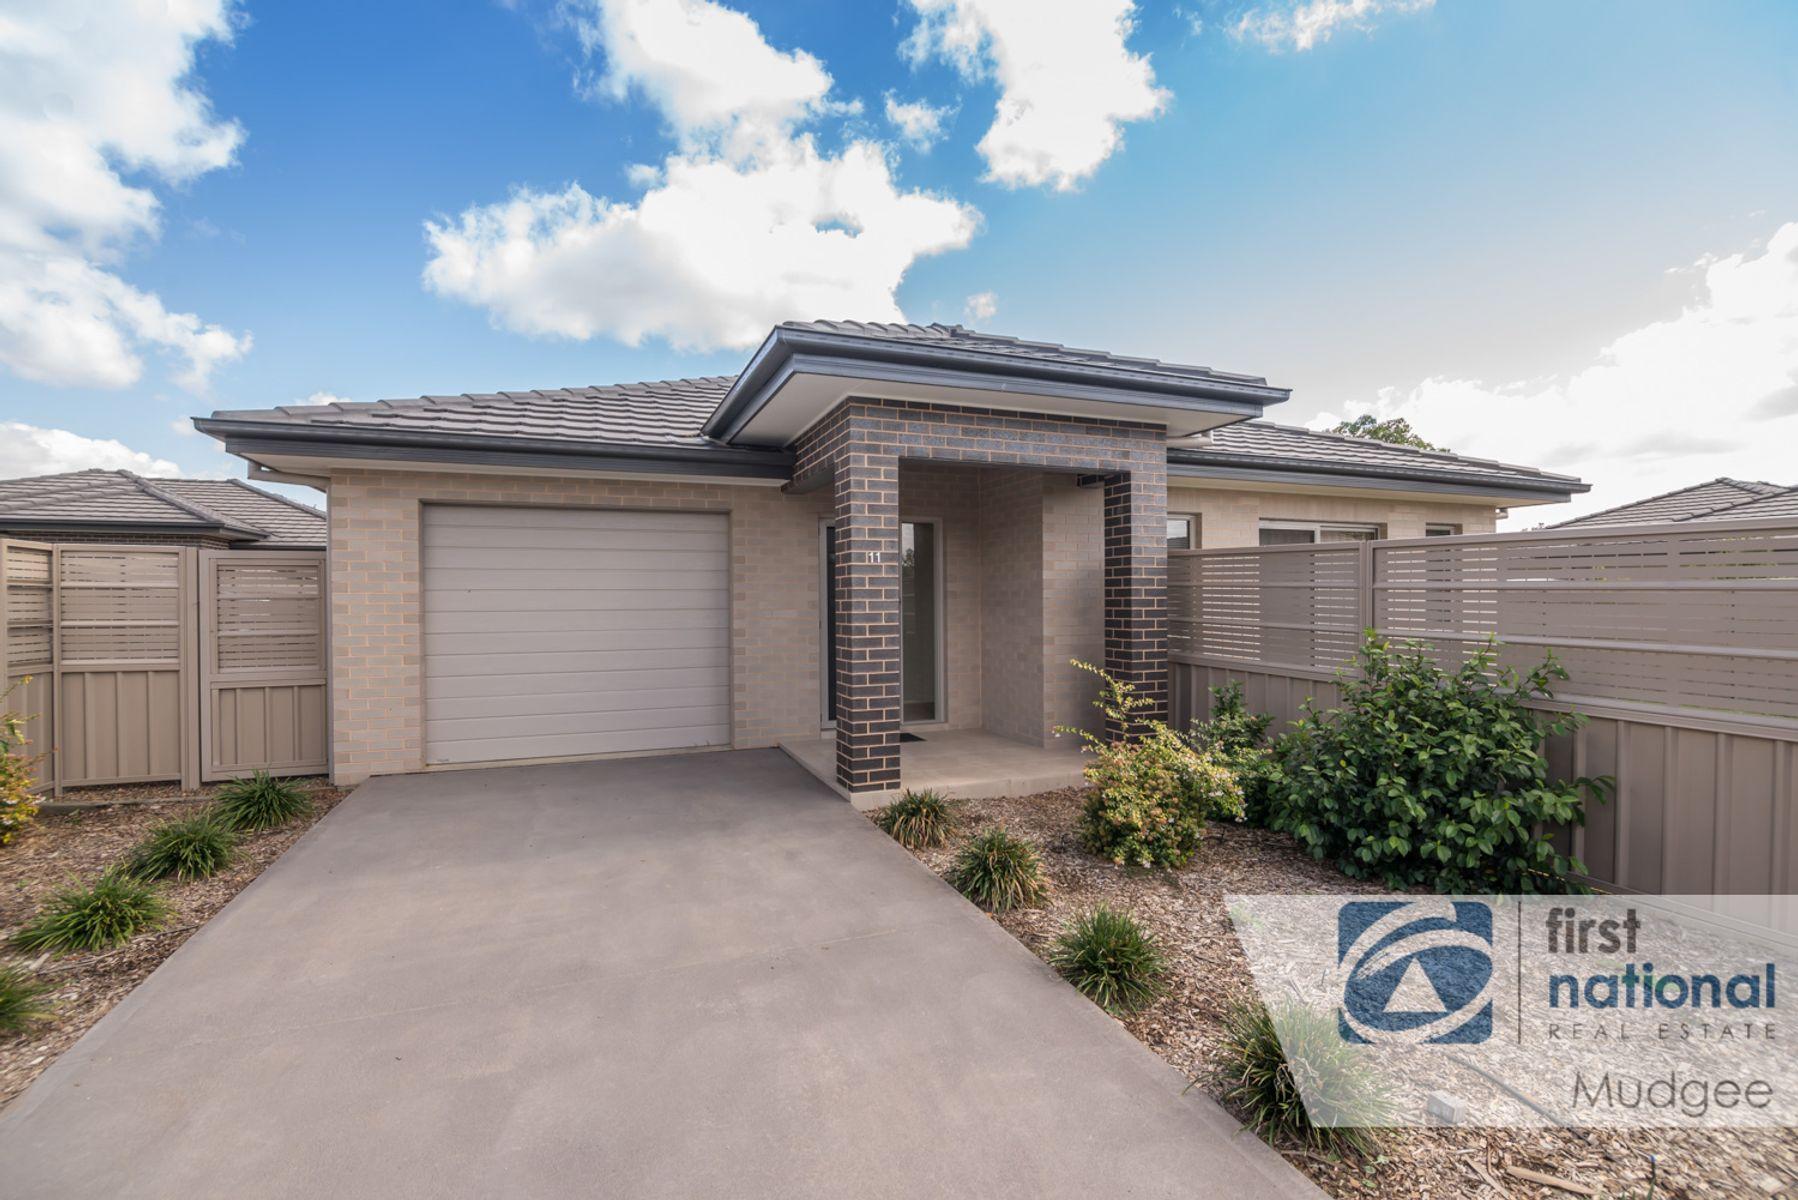 11/20 Burrundulla Avenue, Mudgee, NSW 2850